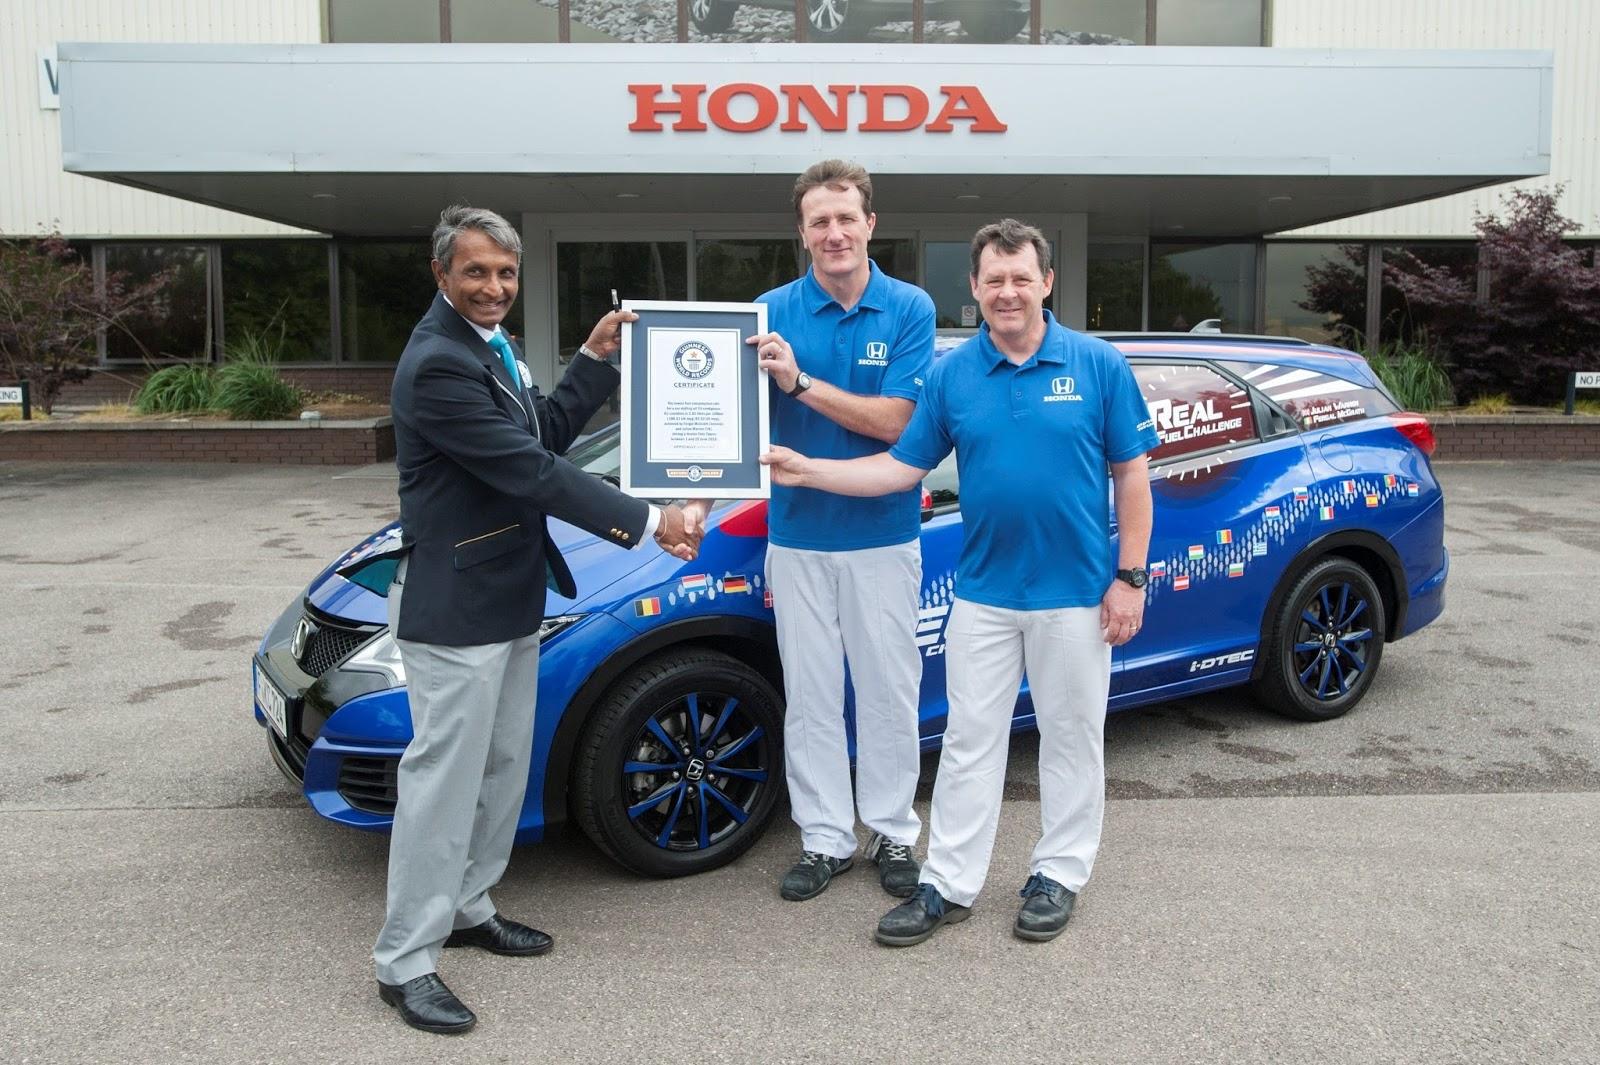 honda2BGuiness World Record H Honda σπάει ρεκόρ Γκίνες στην κατανάλωση: 2,8 l/100 km Honda, Honda Civic, iVtec, κατανάλωση, Ρεκόρ GUINNESS